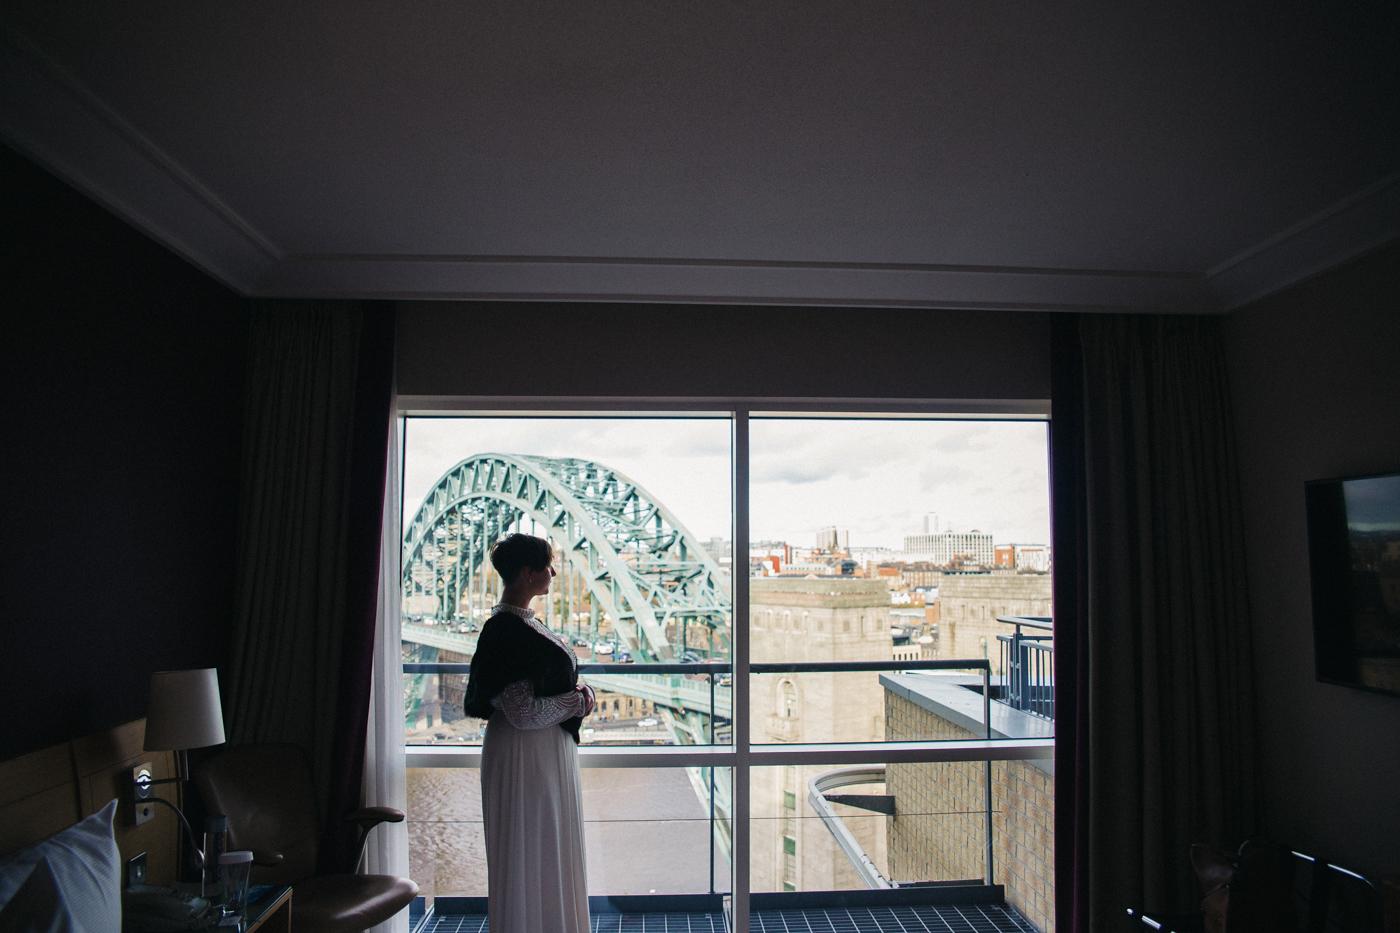 teesside-newcastle-gateshead-wedding-photography-photographer-creative-0022.jpg